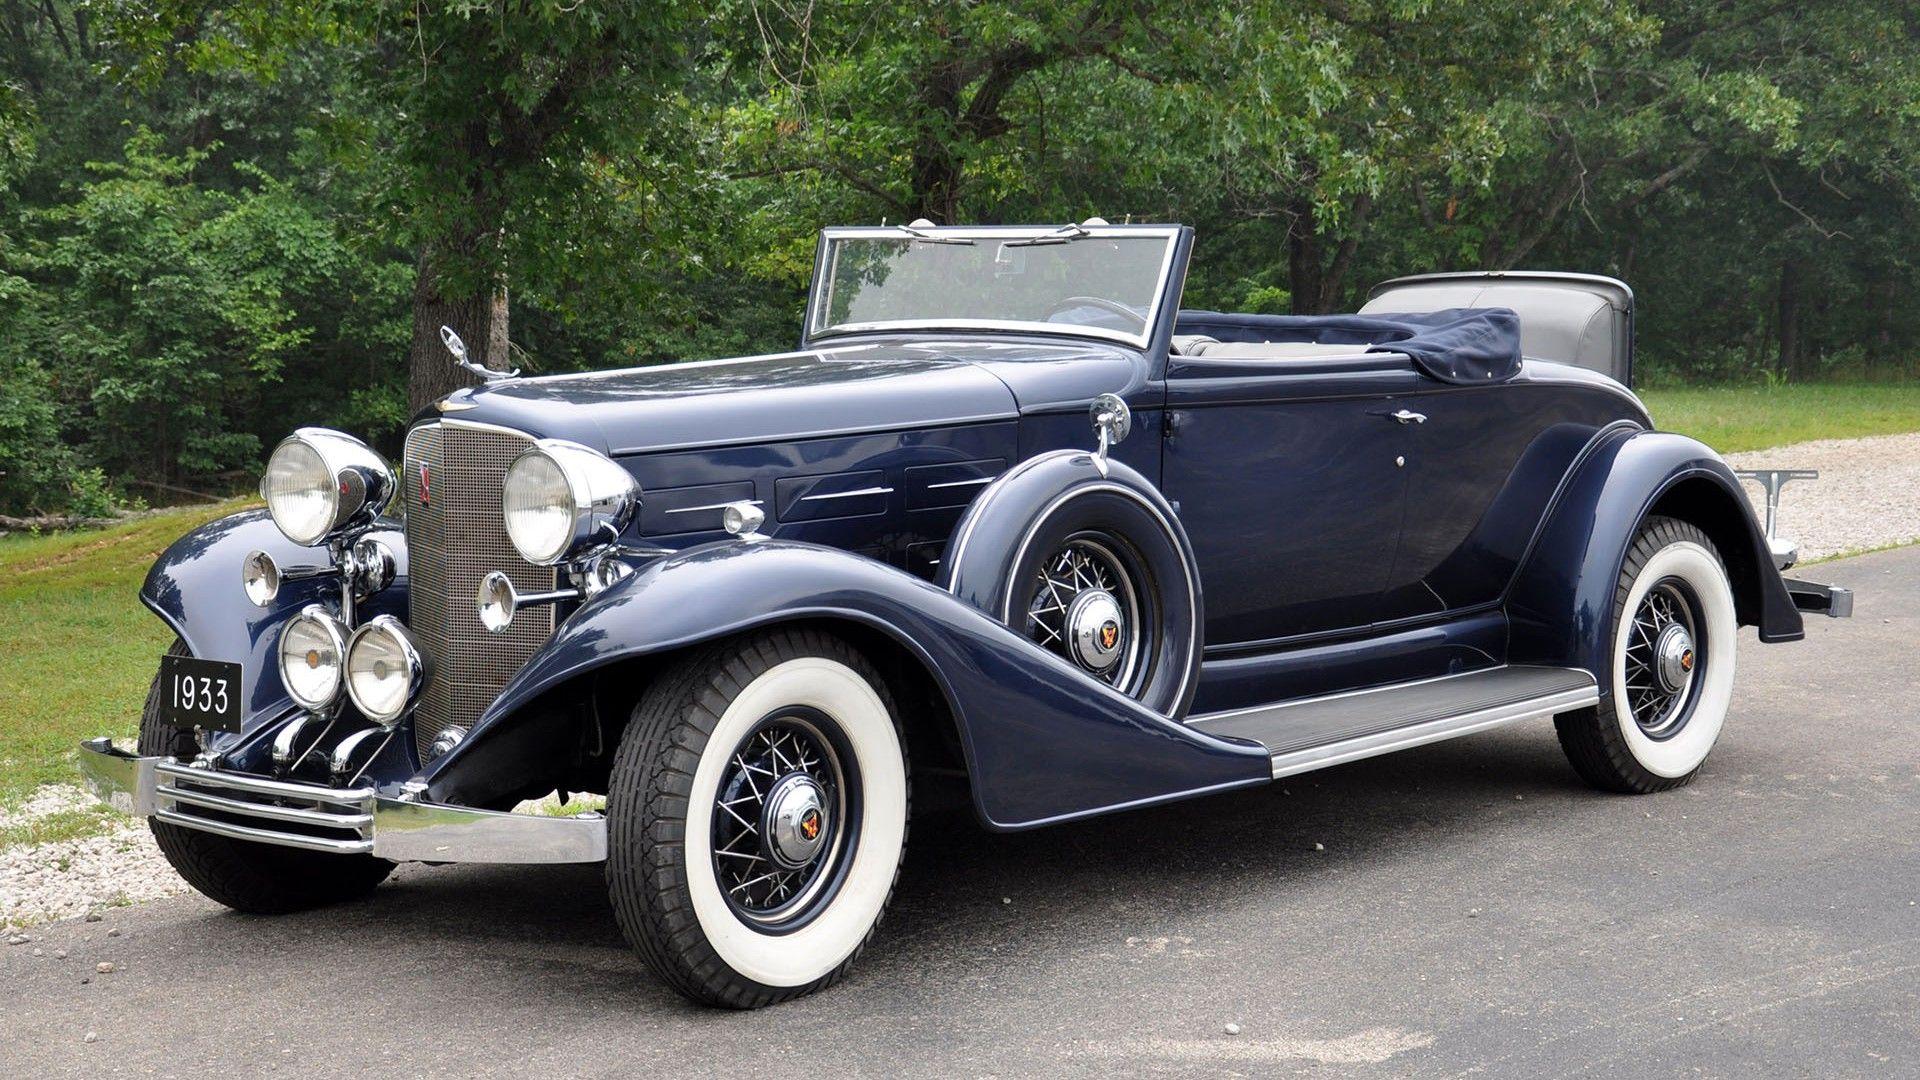 1933 Cadillac, V12 370 C, Convertible (1920×1080) | Cars of the ...